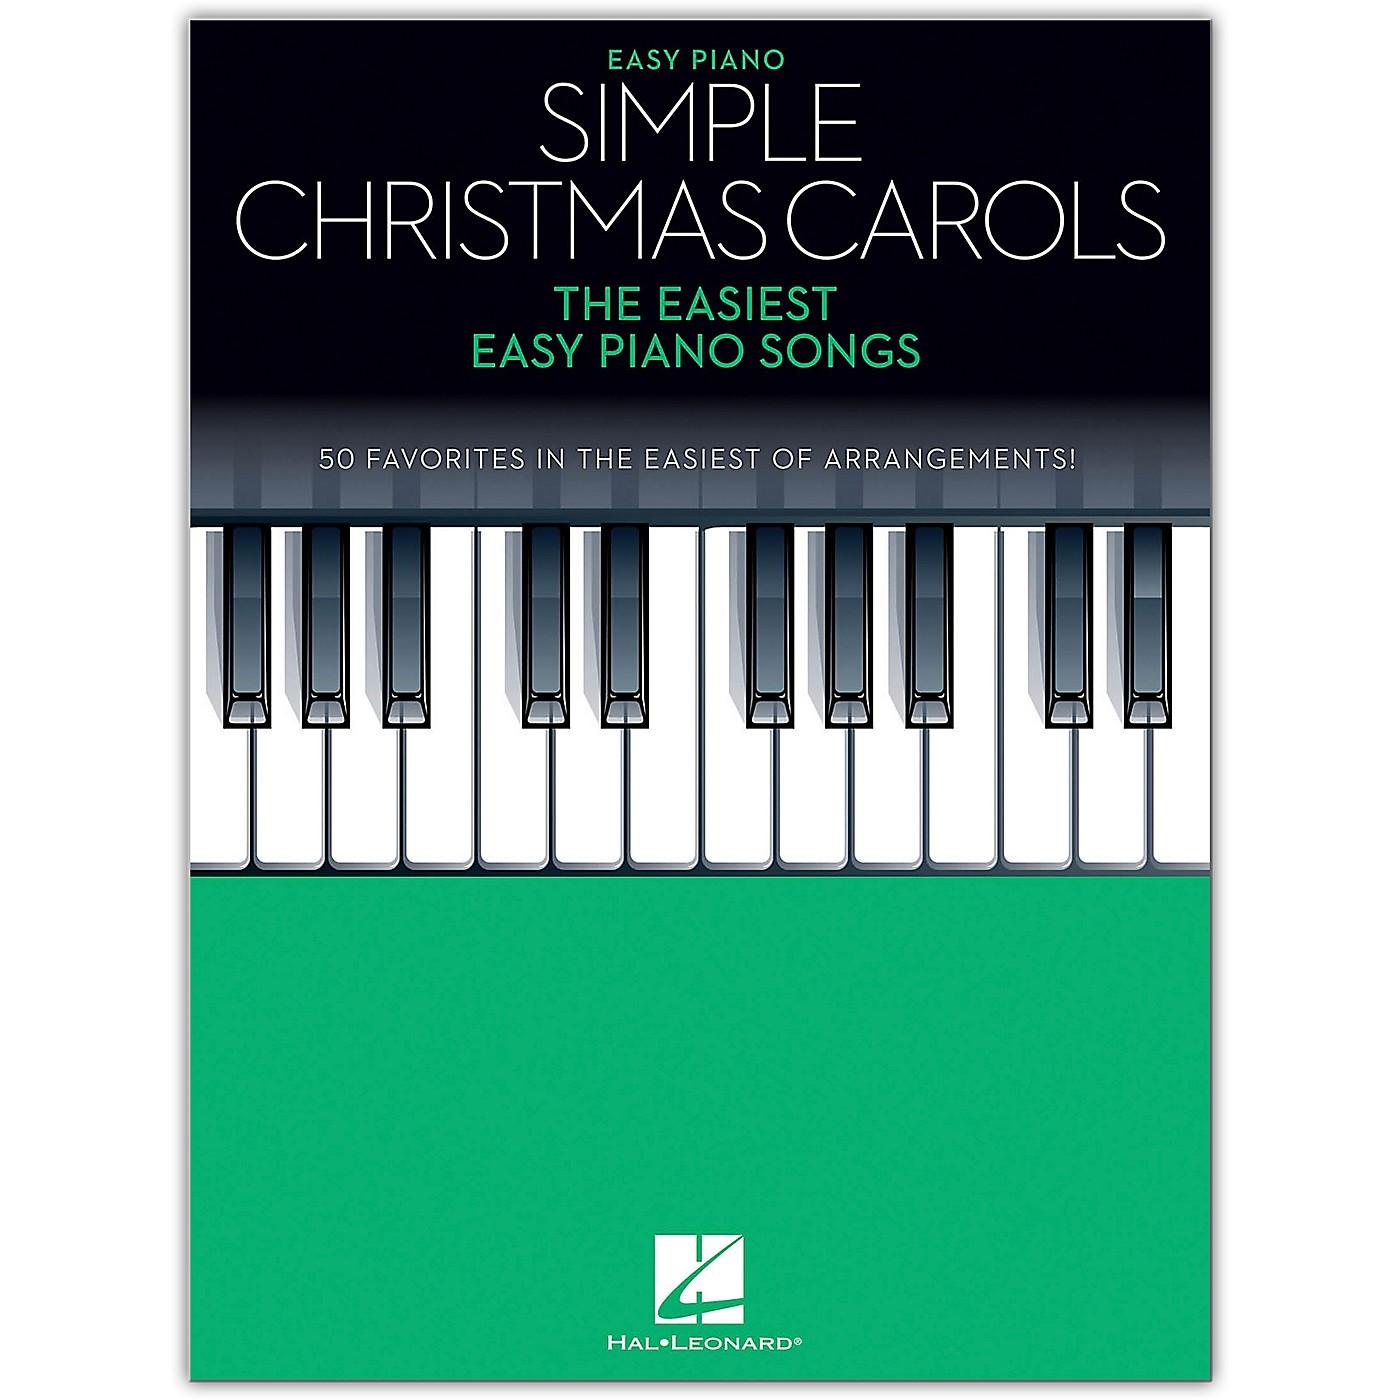 Hal Leonard Simple Christmas Carols (The Easiest Easy Piano Songs) Easy Piano Songbook thumbnail